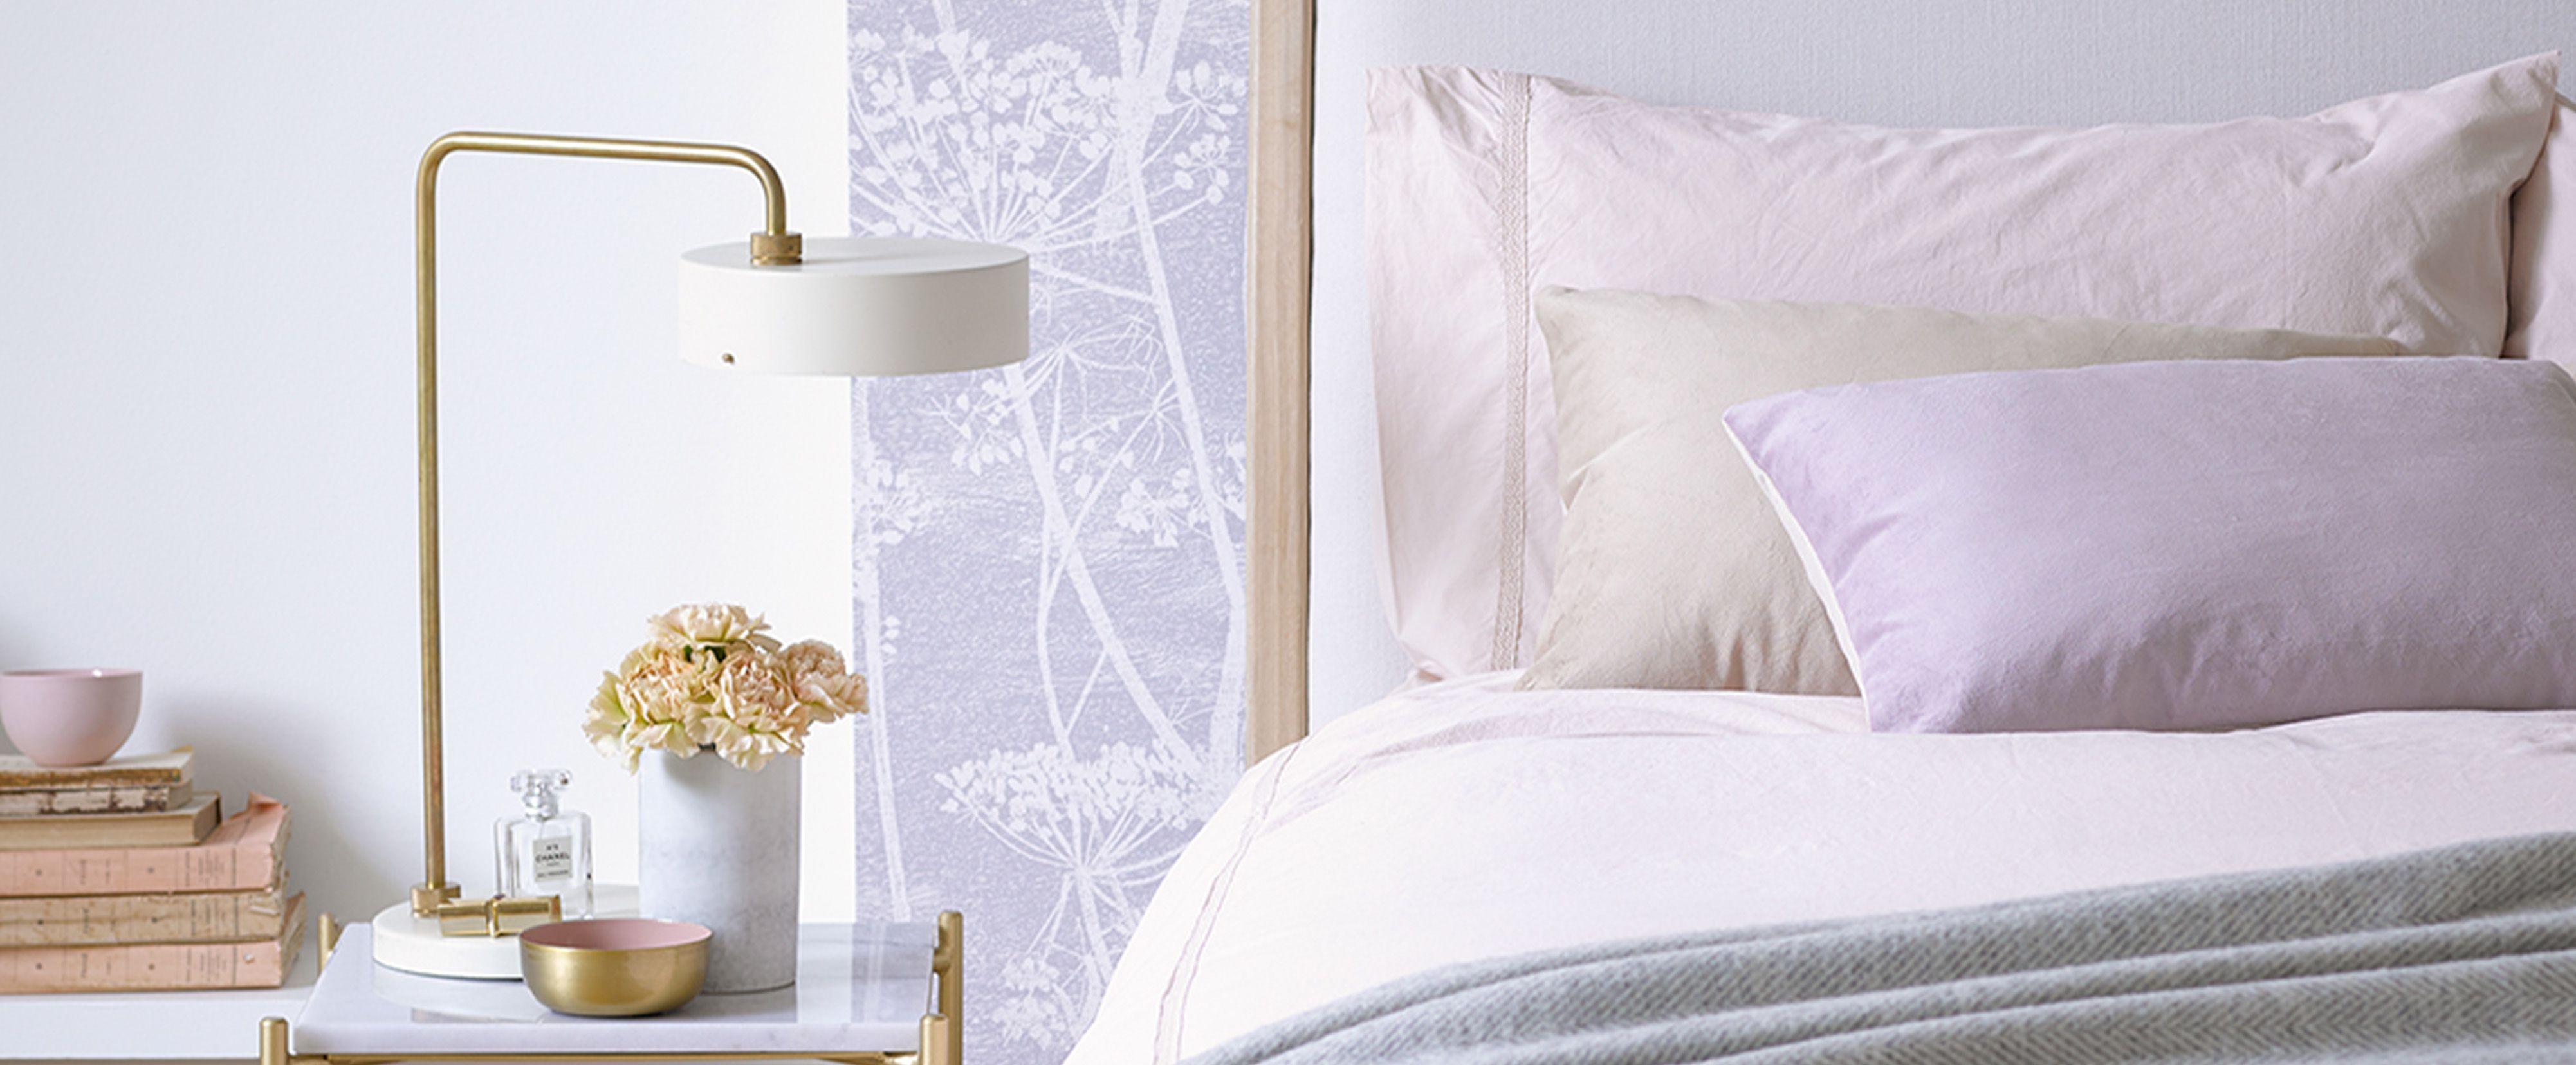 single-bed.jpg